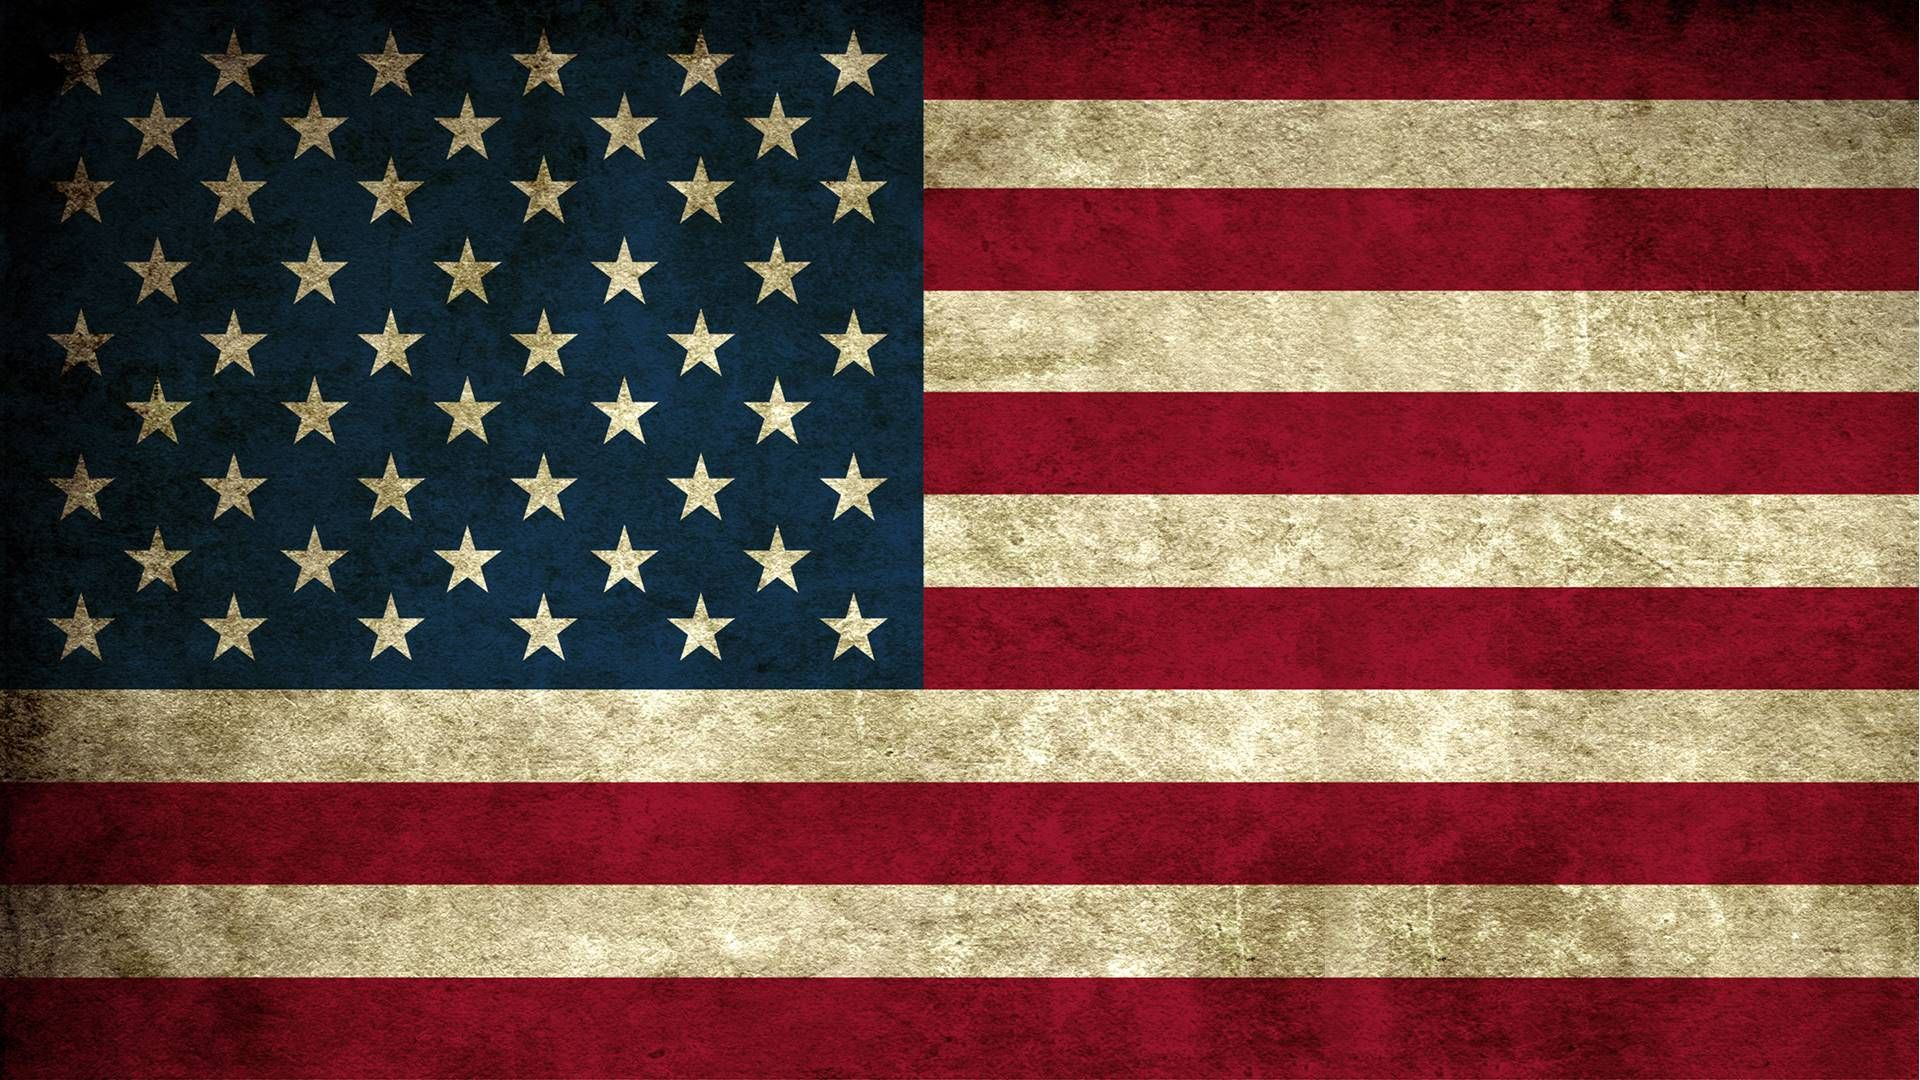 HD. 1920 x 1080. Gritty flag. | American flag wallpaper, Usa flag  wallpaper, American flag images